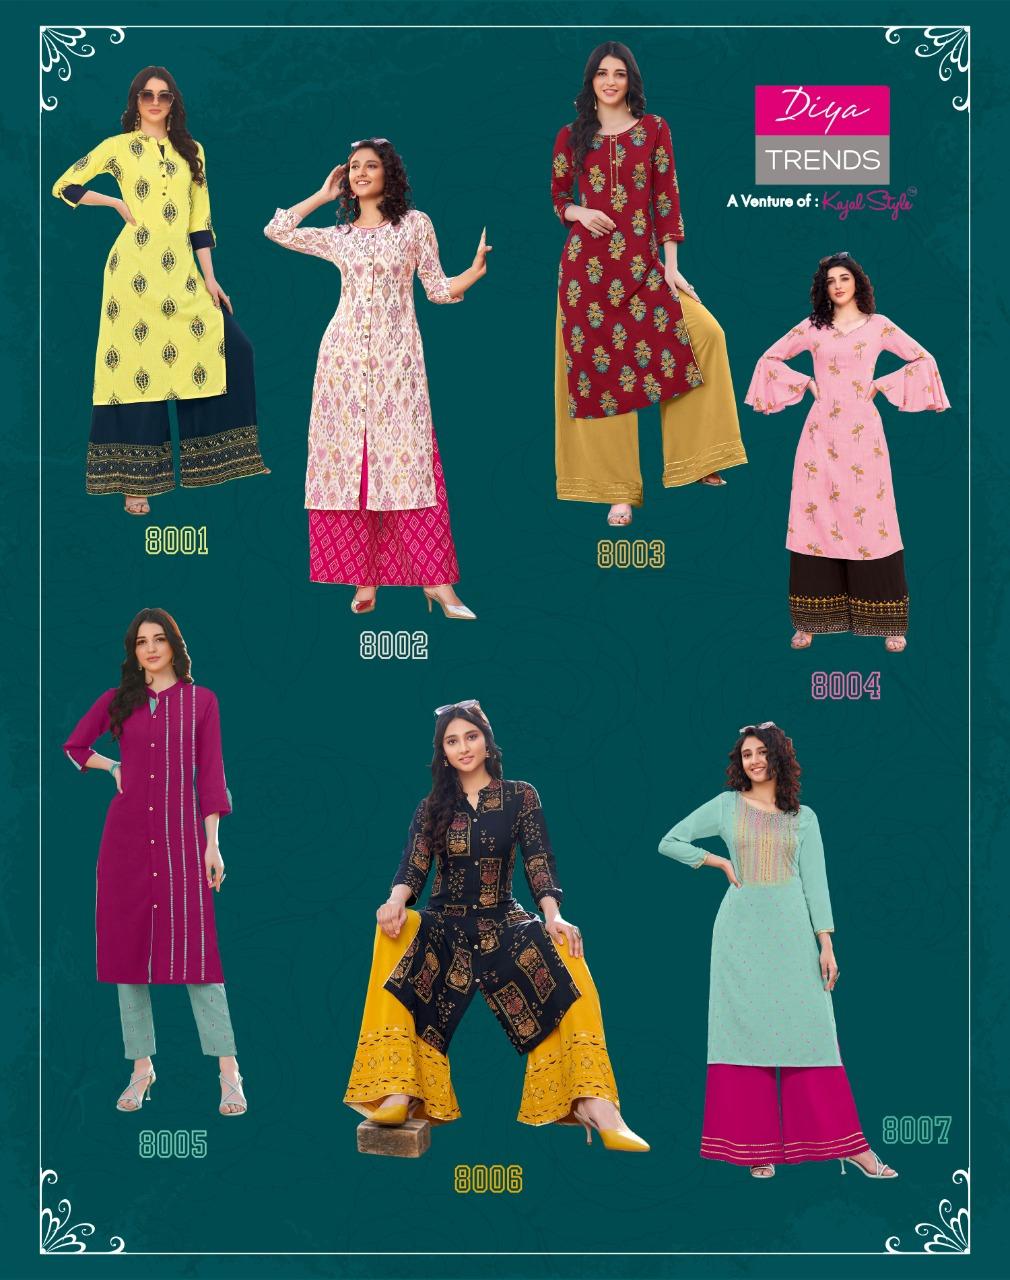 Diya Trends Bibas Vol 8 by Kajal Style Kurti with Palazzo Pant Wholesale Catalog 14 Pcs 14 - Diya Trends Biba's Vol 8 by Kajal Style Kurti with Palazzo Pant Wholesale Catalog 14 Pcs